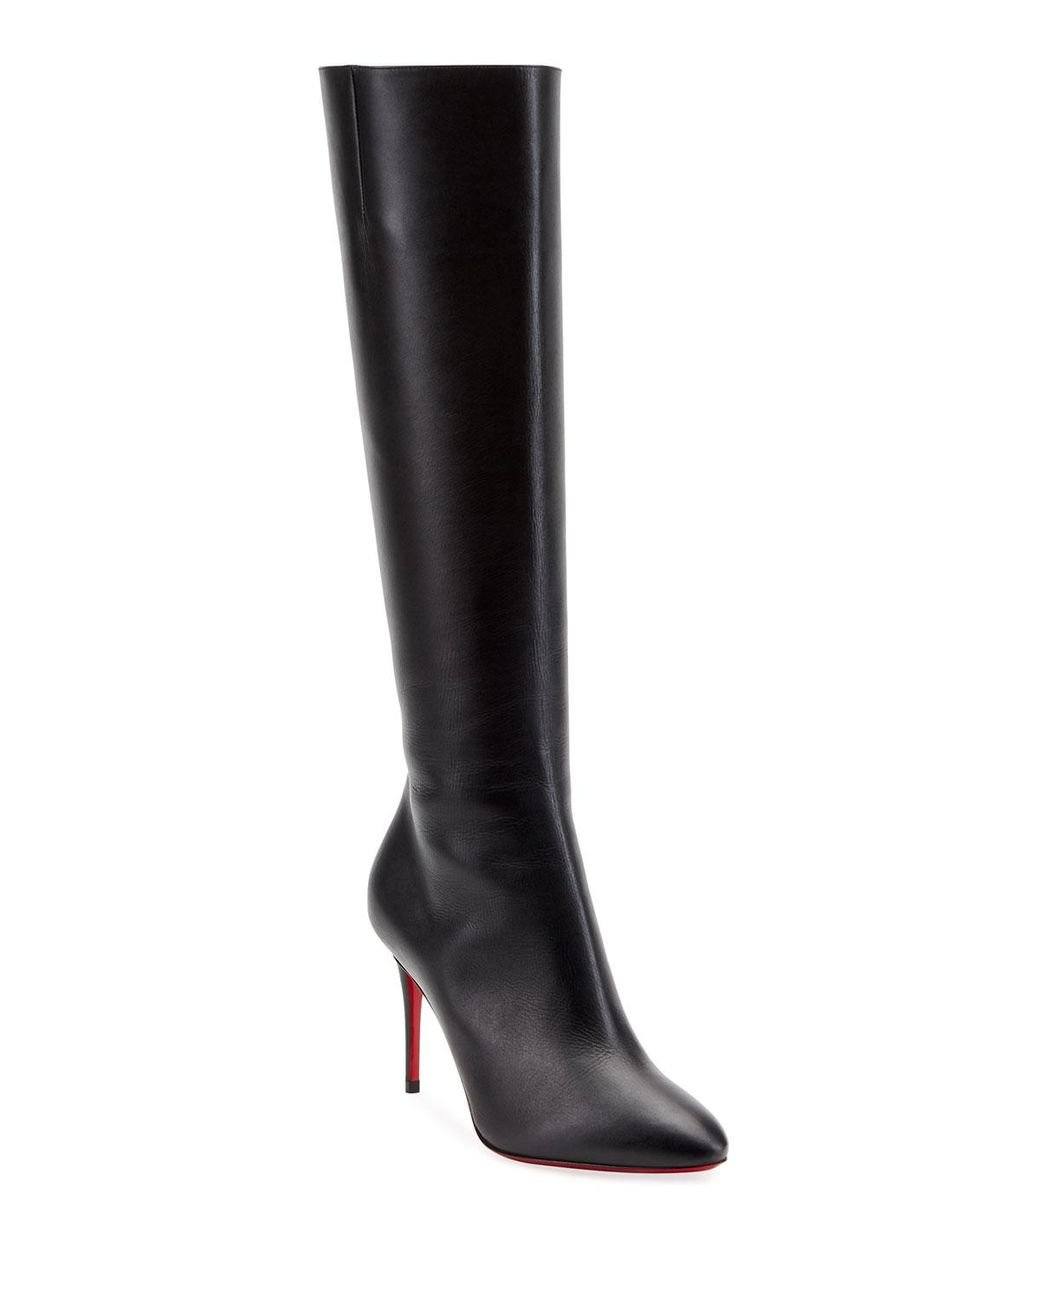 wholesale dealer 58b19 62e36 Women's Black Eloise Botta Red Sole Boots